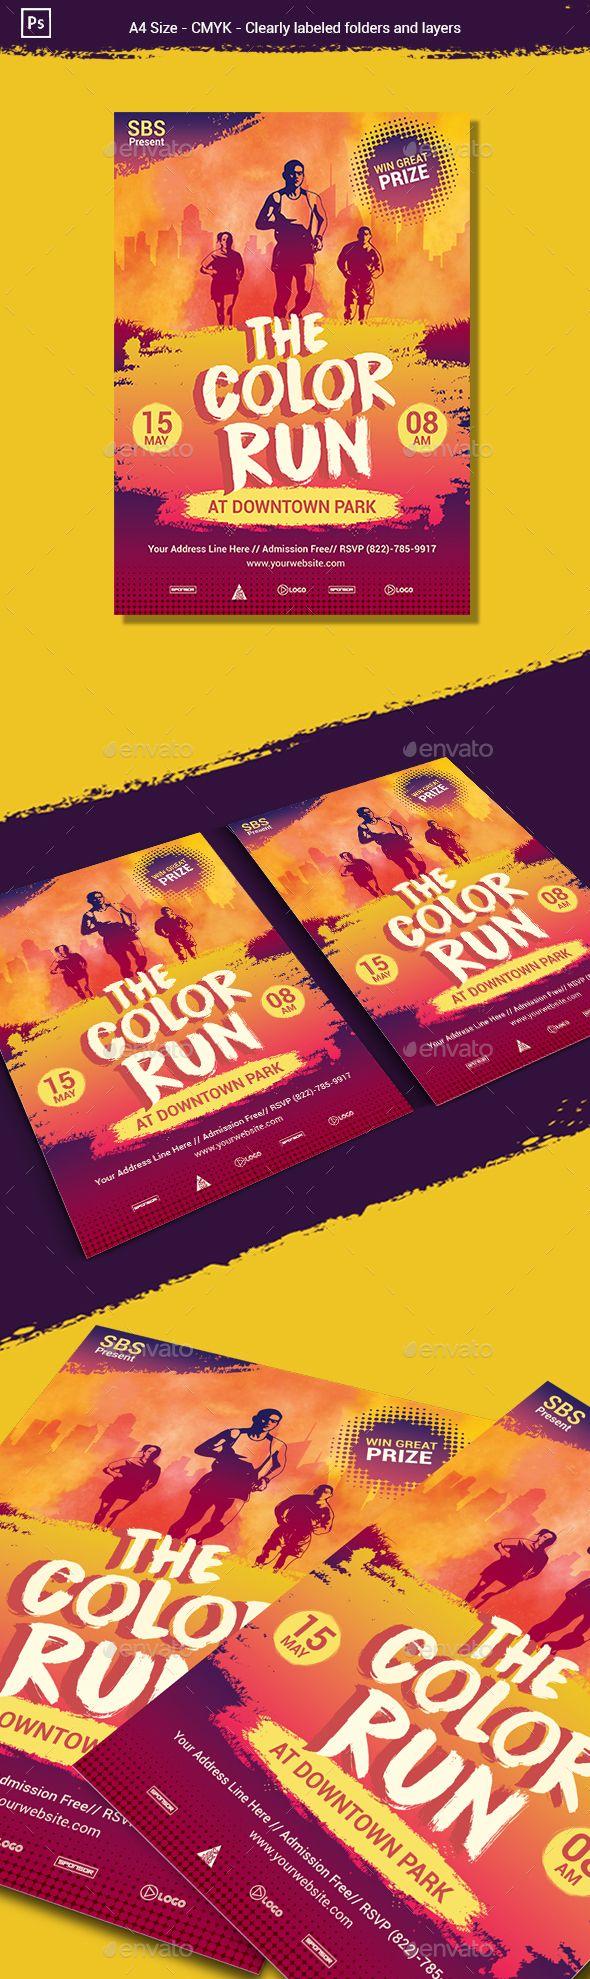 the colour run flyer poster template psd flyer templates